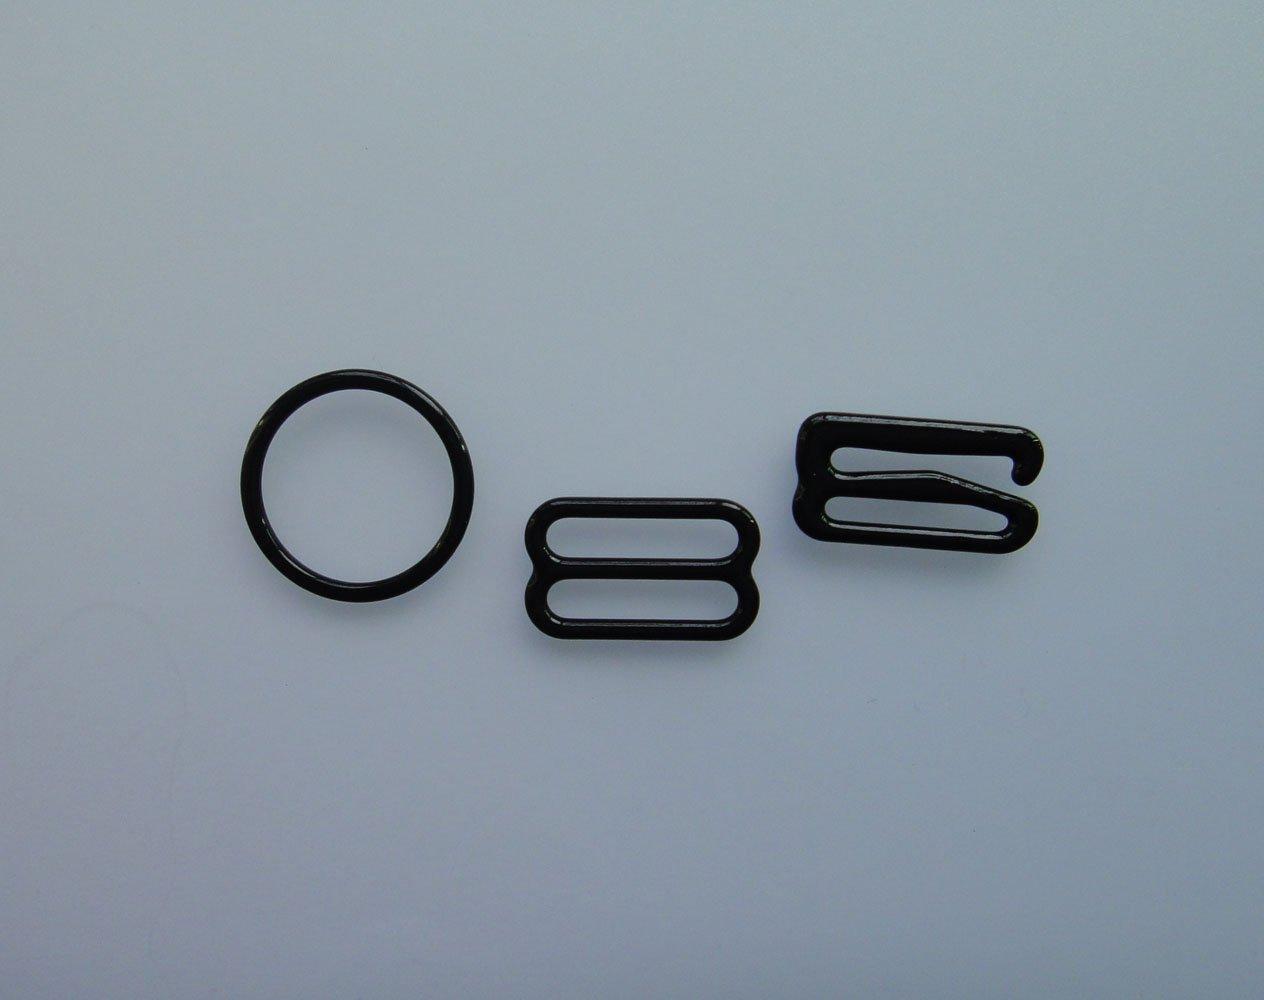 Lyracces 100pcs Nylon Coated Metal bra Lingerie Adjustment strap slides rings Rectangular Figure adjustor 8 0 Hooks Hoops clasp 9 (20mm 0.79'', Black) by LYRACCES